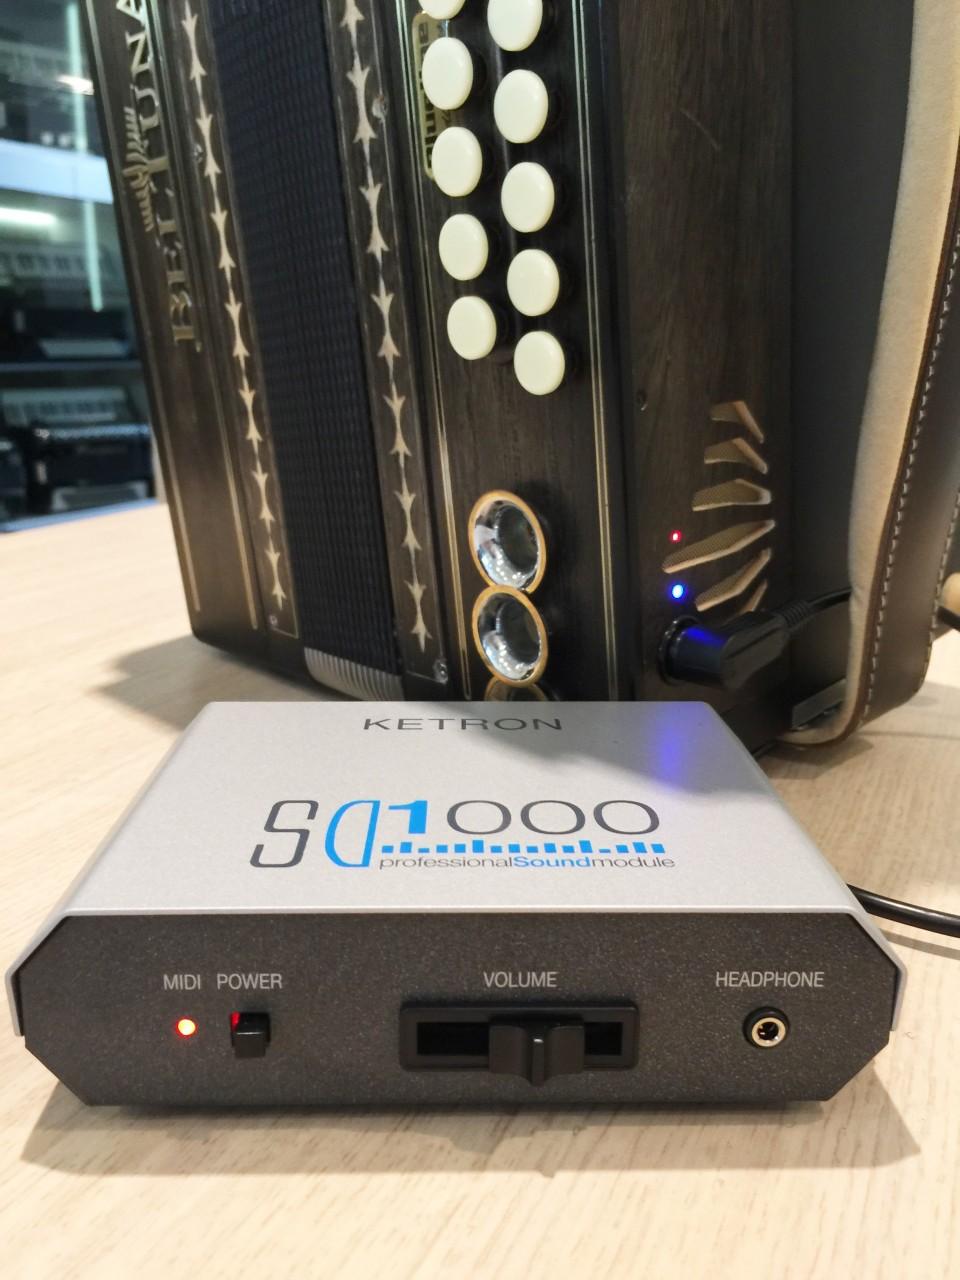 BlueLine Bas-Midi & Ketron SD1000 soundmodule